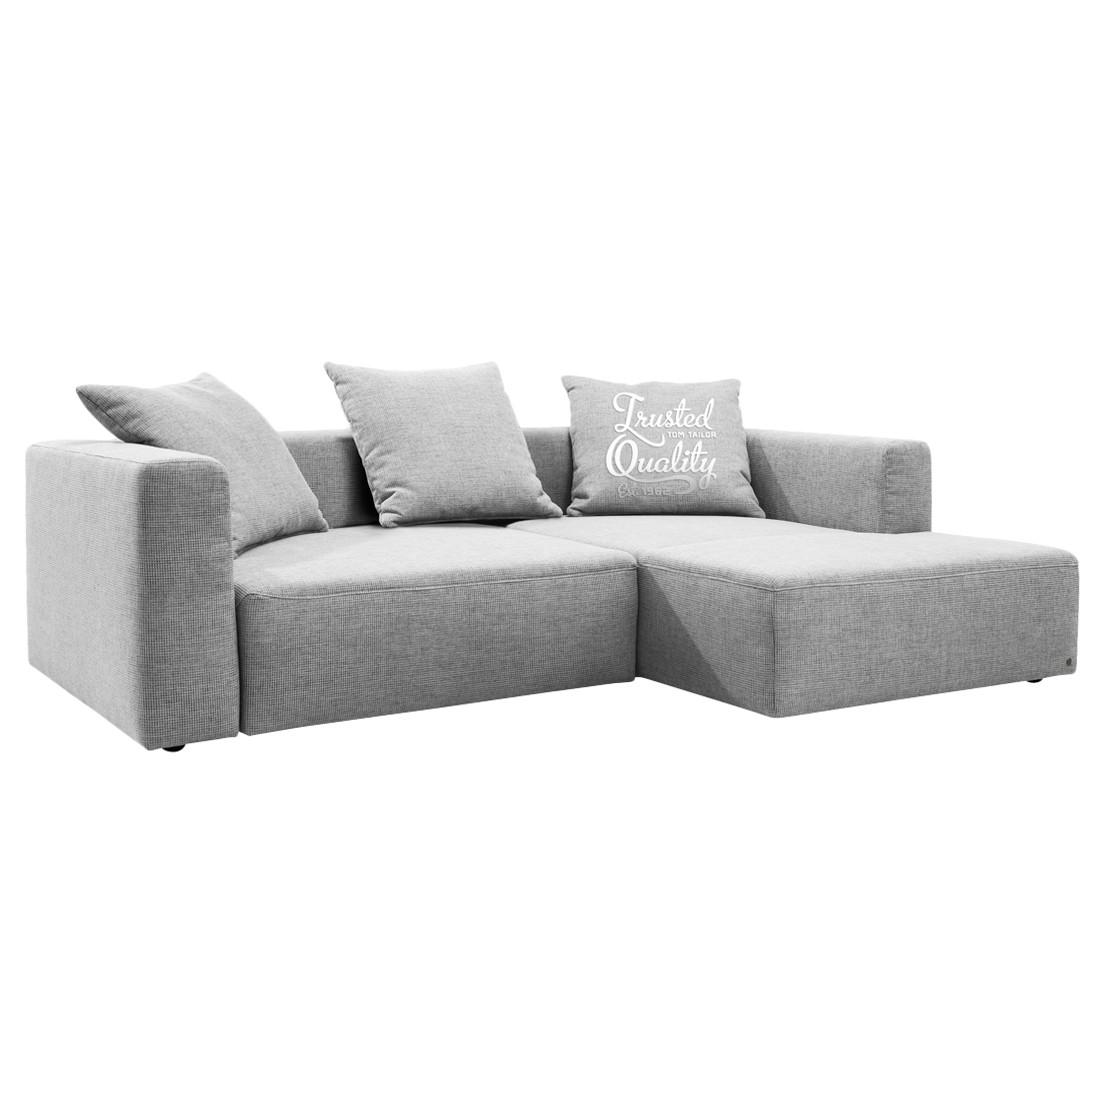 ecksofa heaven casual webstoff kies longchair davorstehend rechts ohne schlaffunktion tom. Black Bedroom Furniture Sets. Home Design Ideas